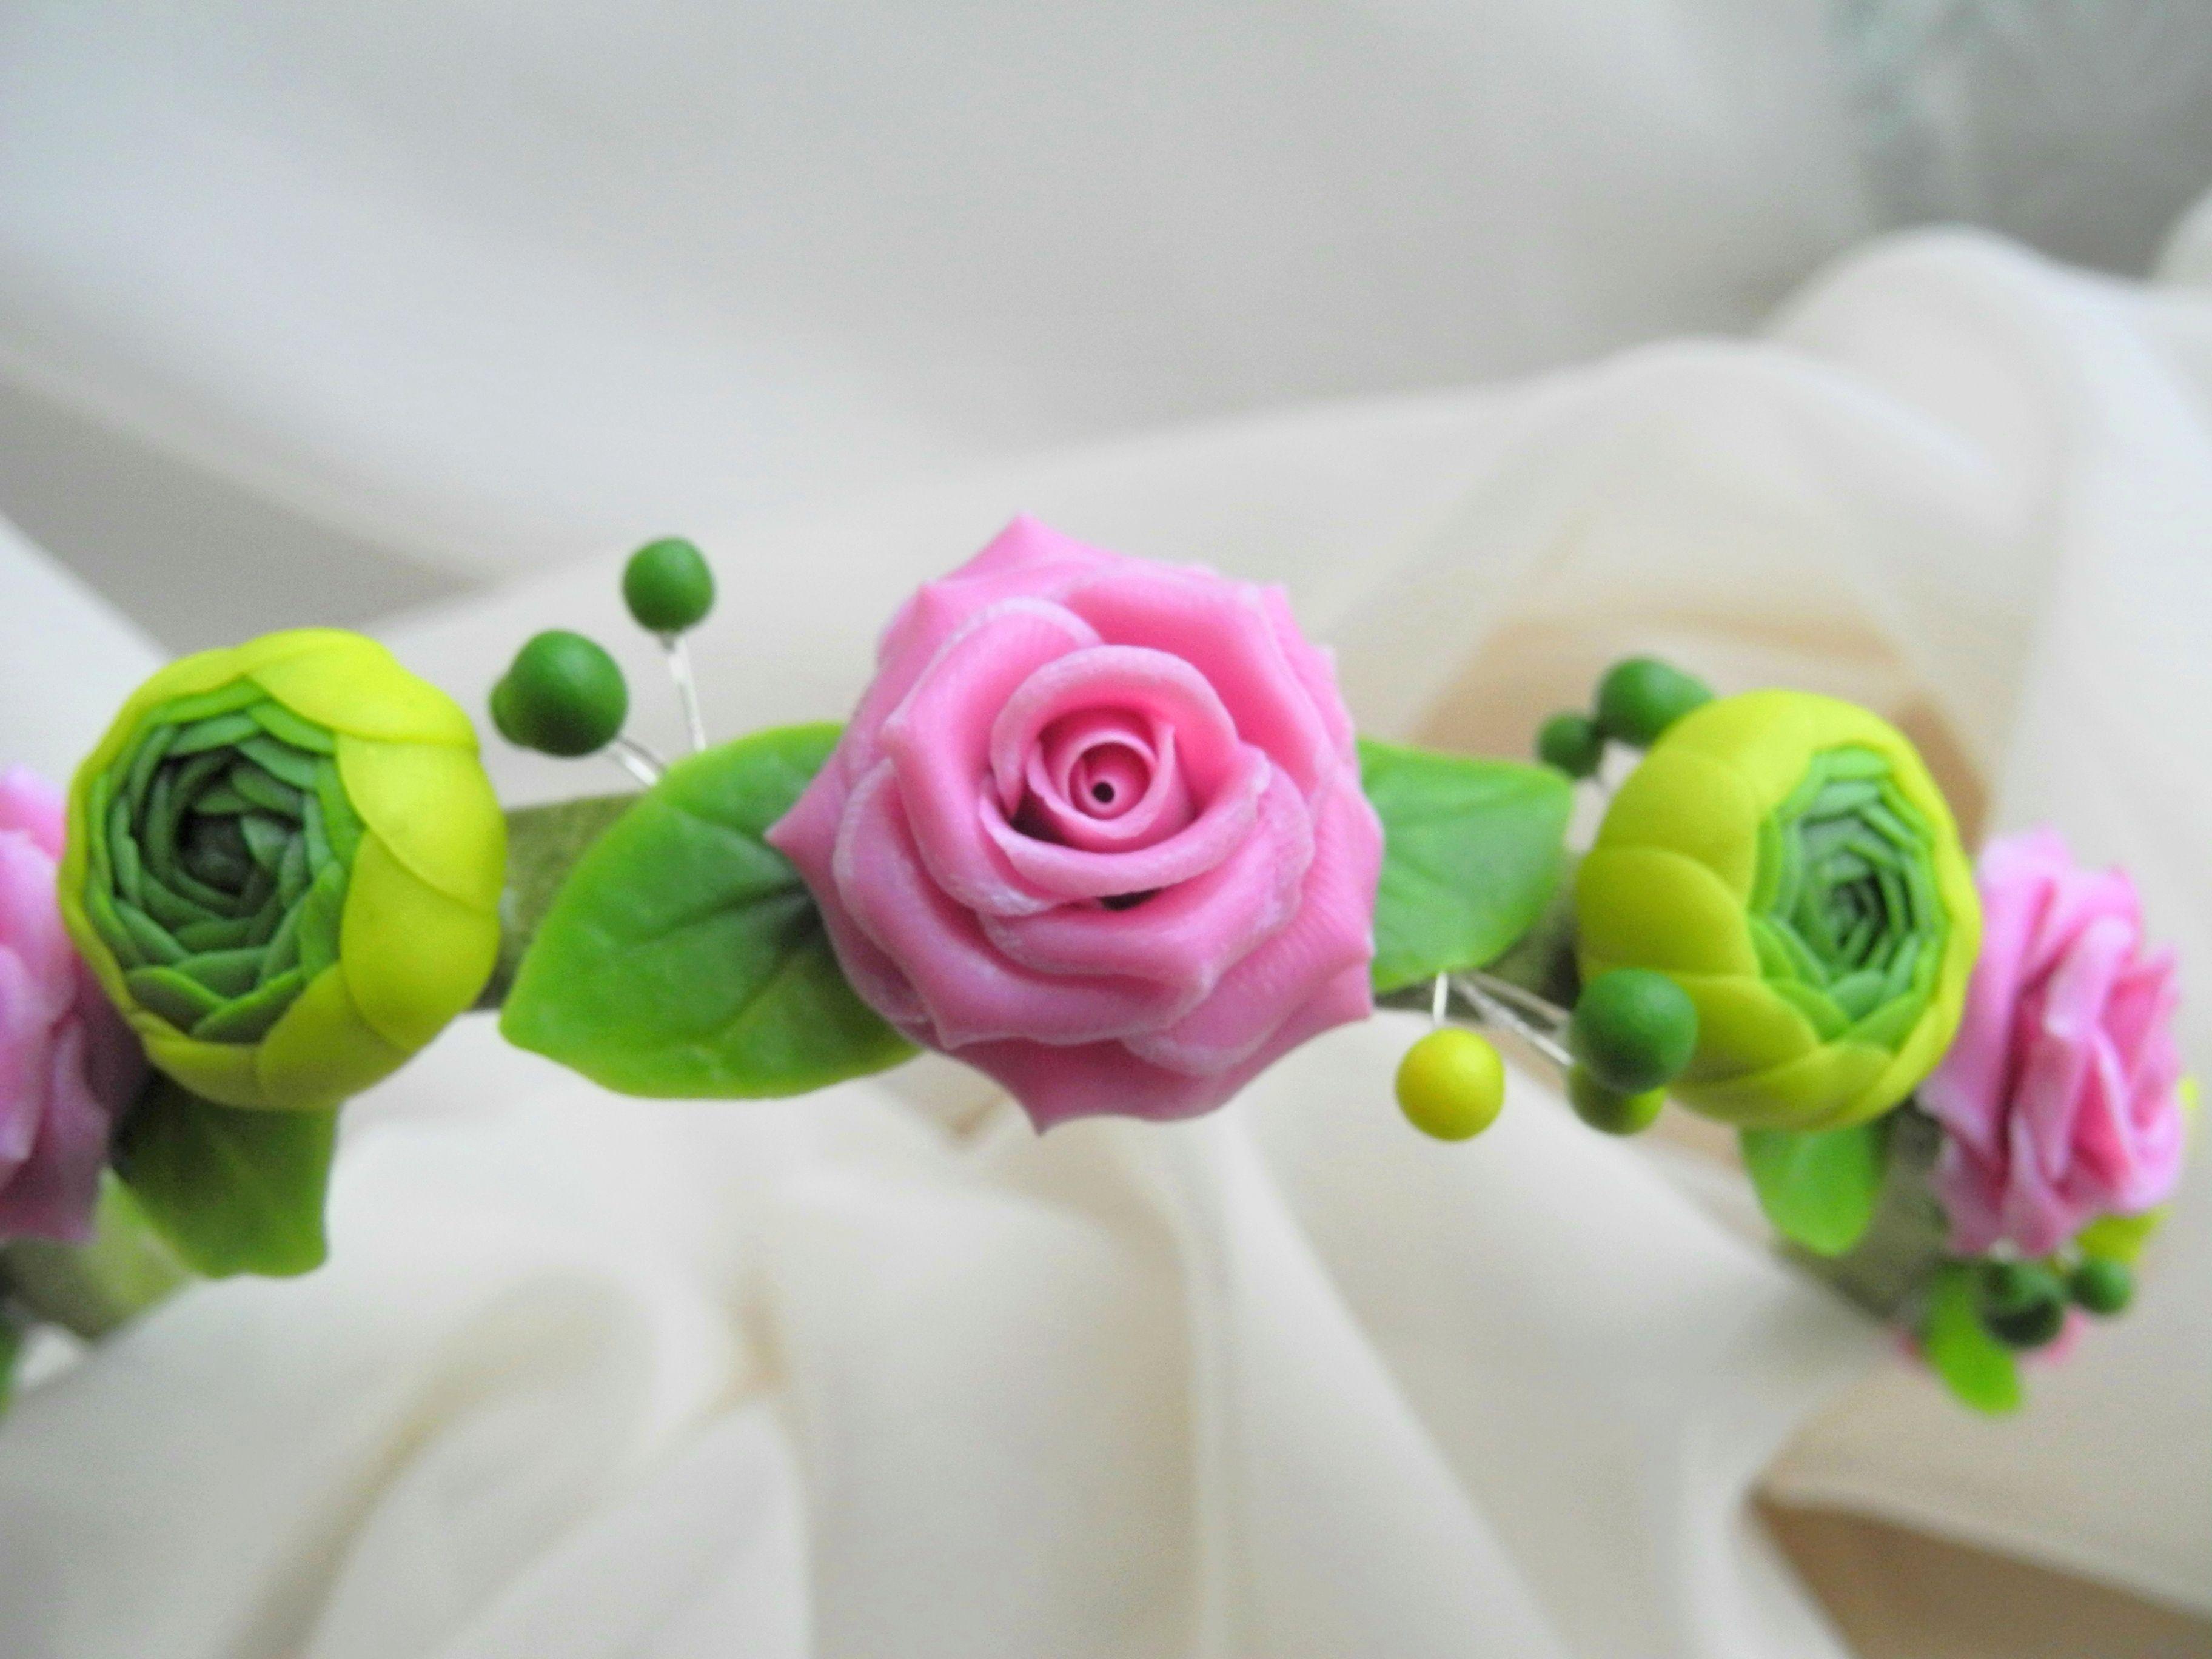 handmade porcelain handmadegift rose headband flowers bijou wreath ranunculus cold ceramic